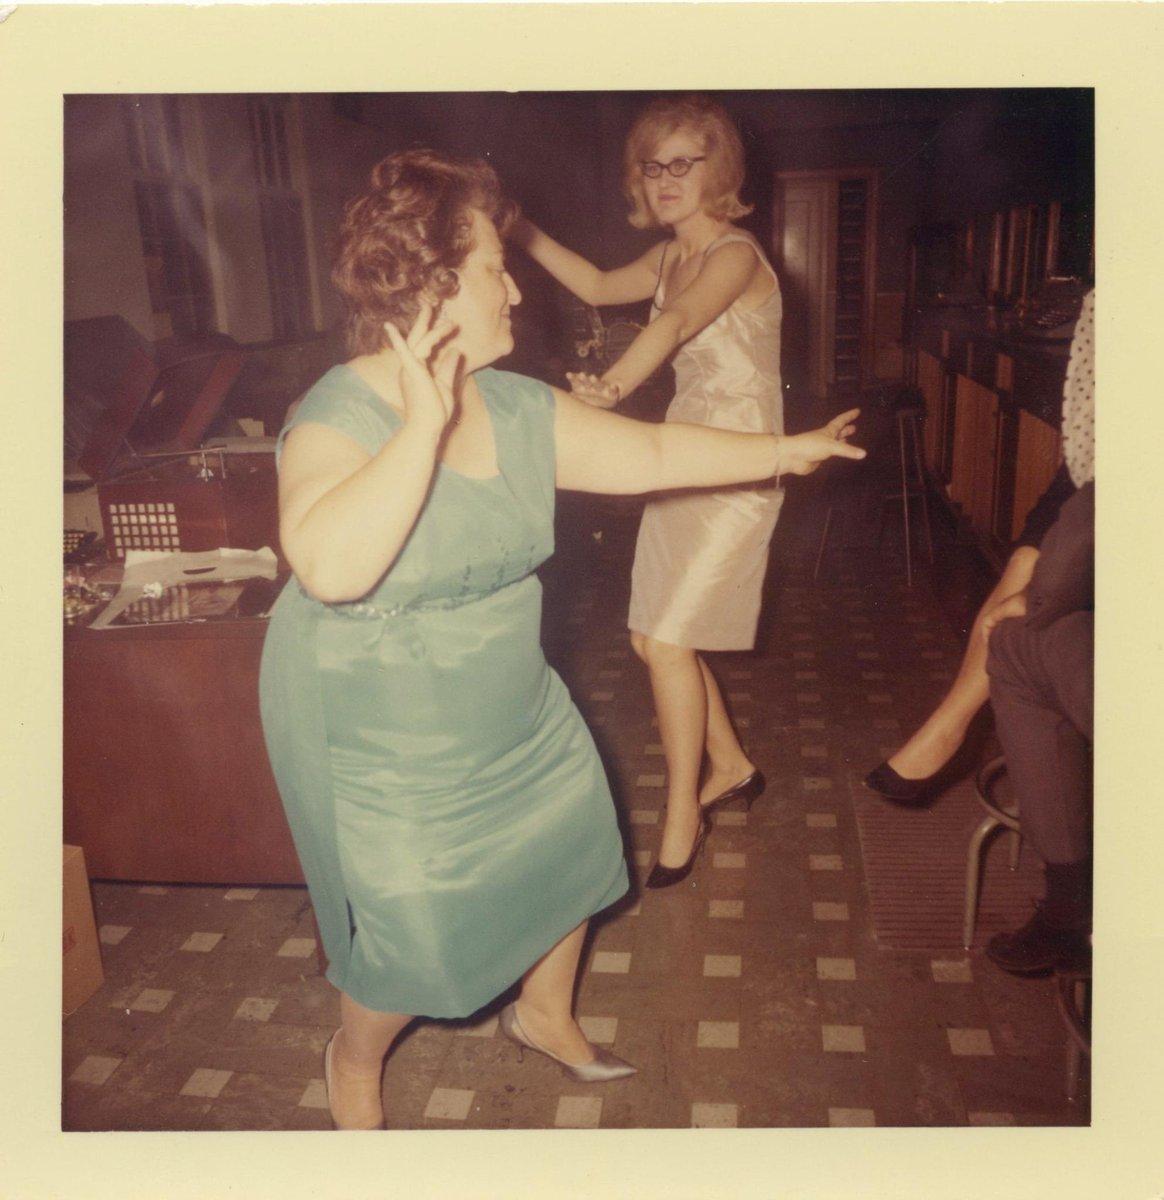 The Dance - vintage snapshot via Ed Engel